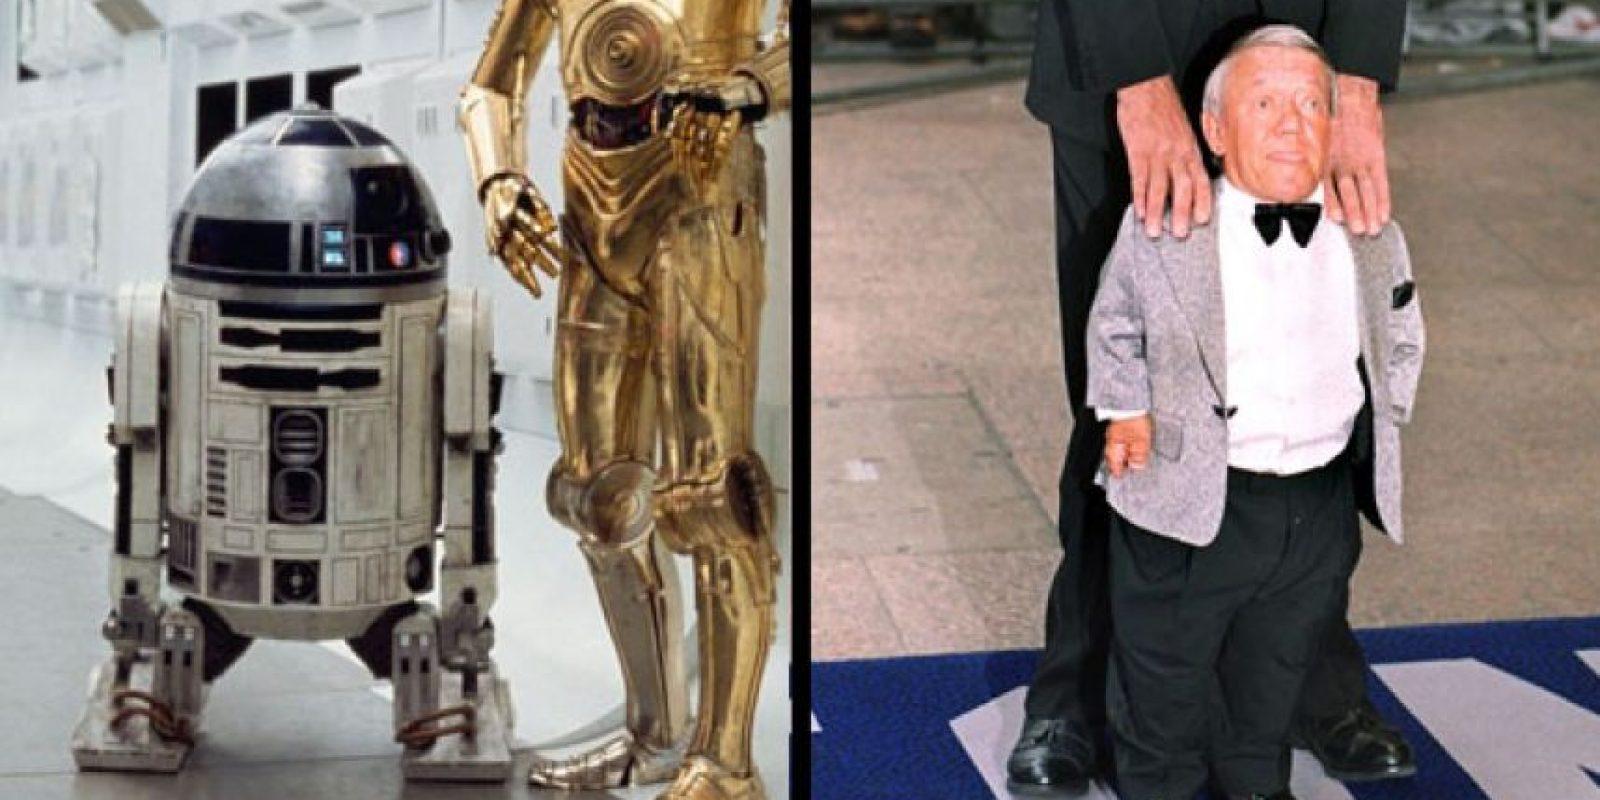 Kenny Baker interpretó a R2D2. Ya no está activo. Foto: The Hollywood Reporter.